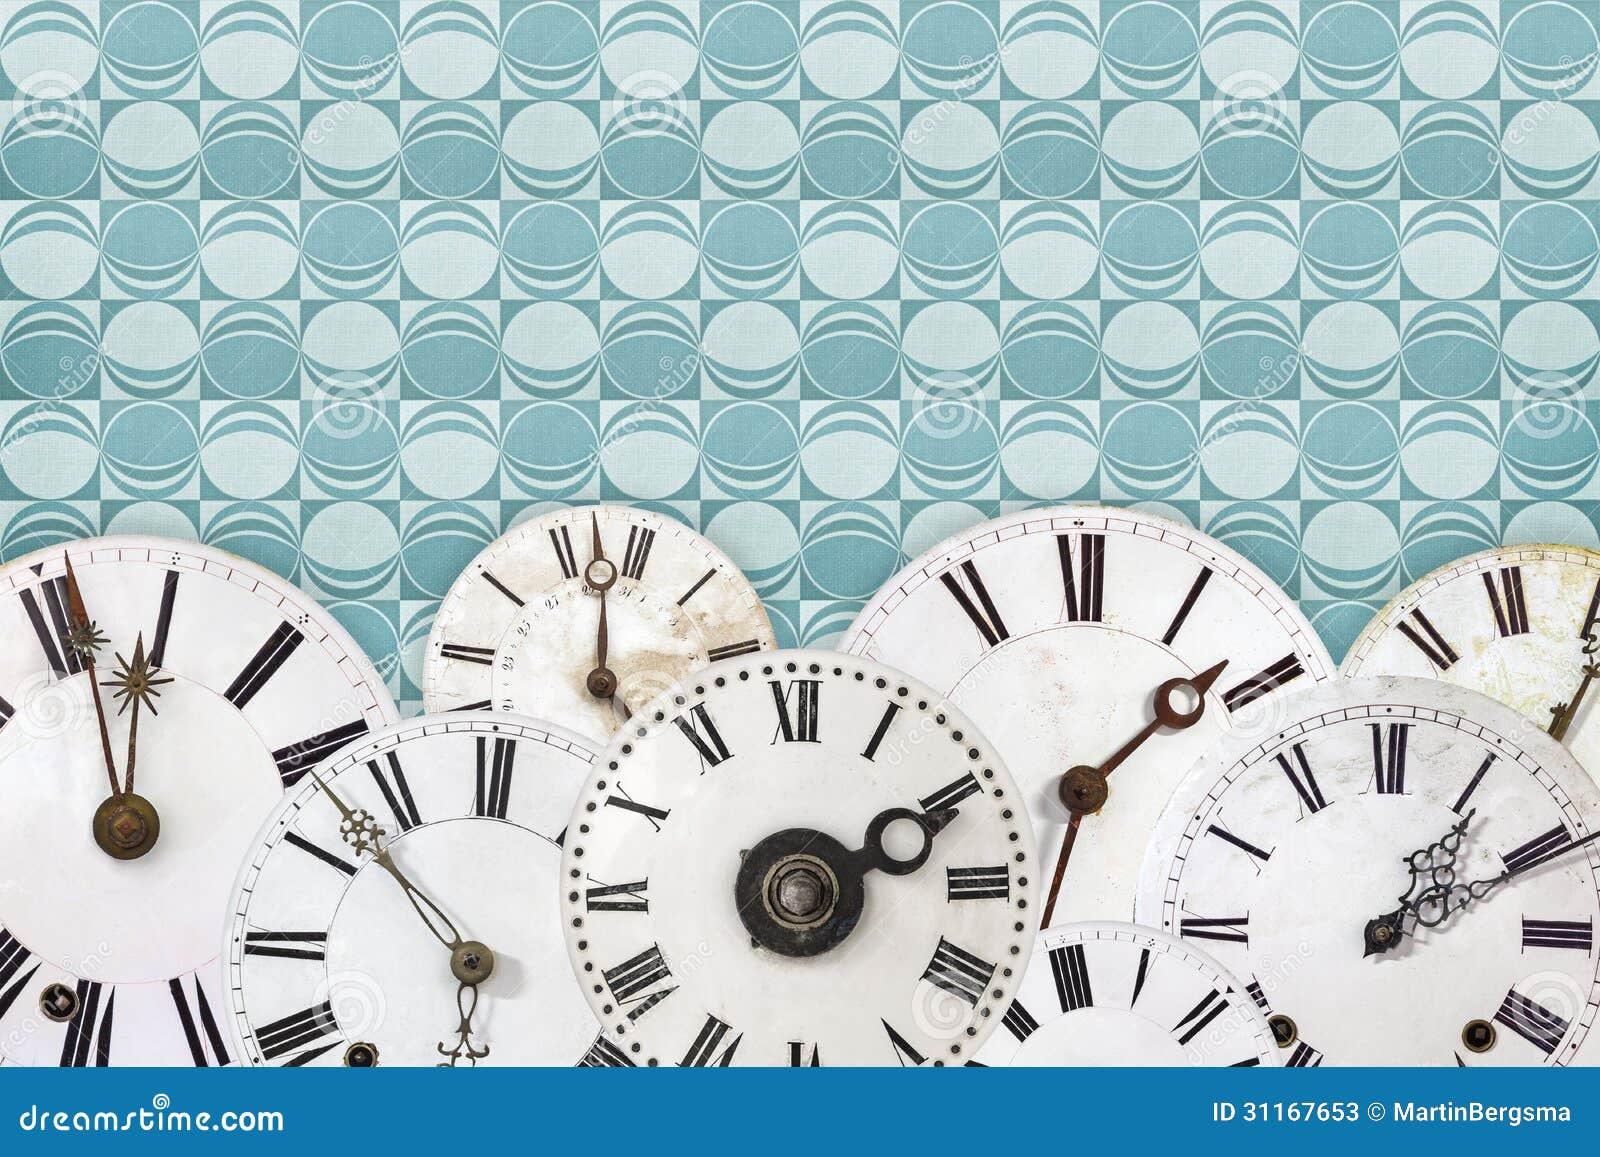 Set Of Vintage Clock Faces Against A Retro Wallpaper ...